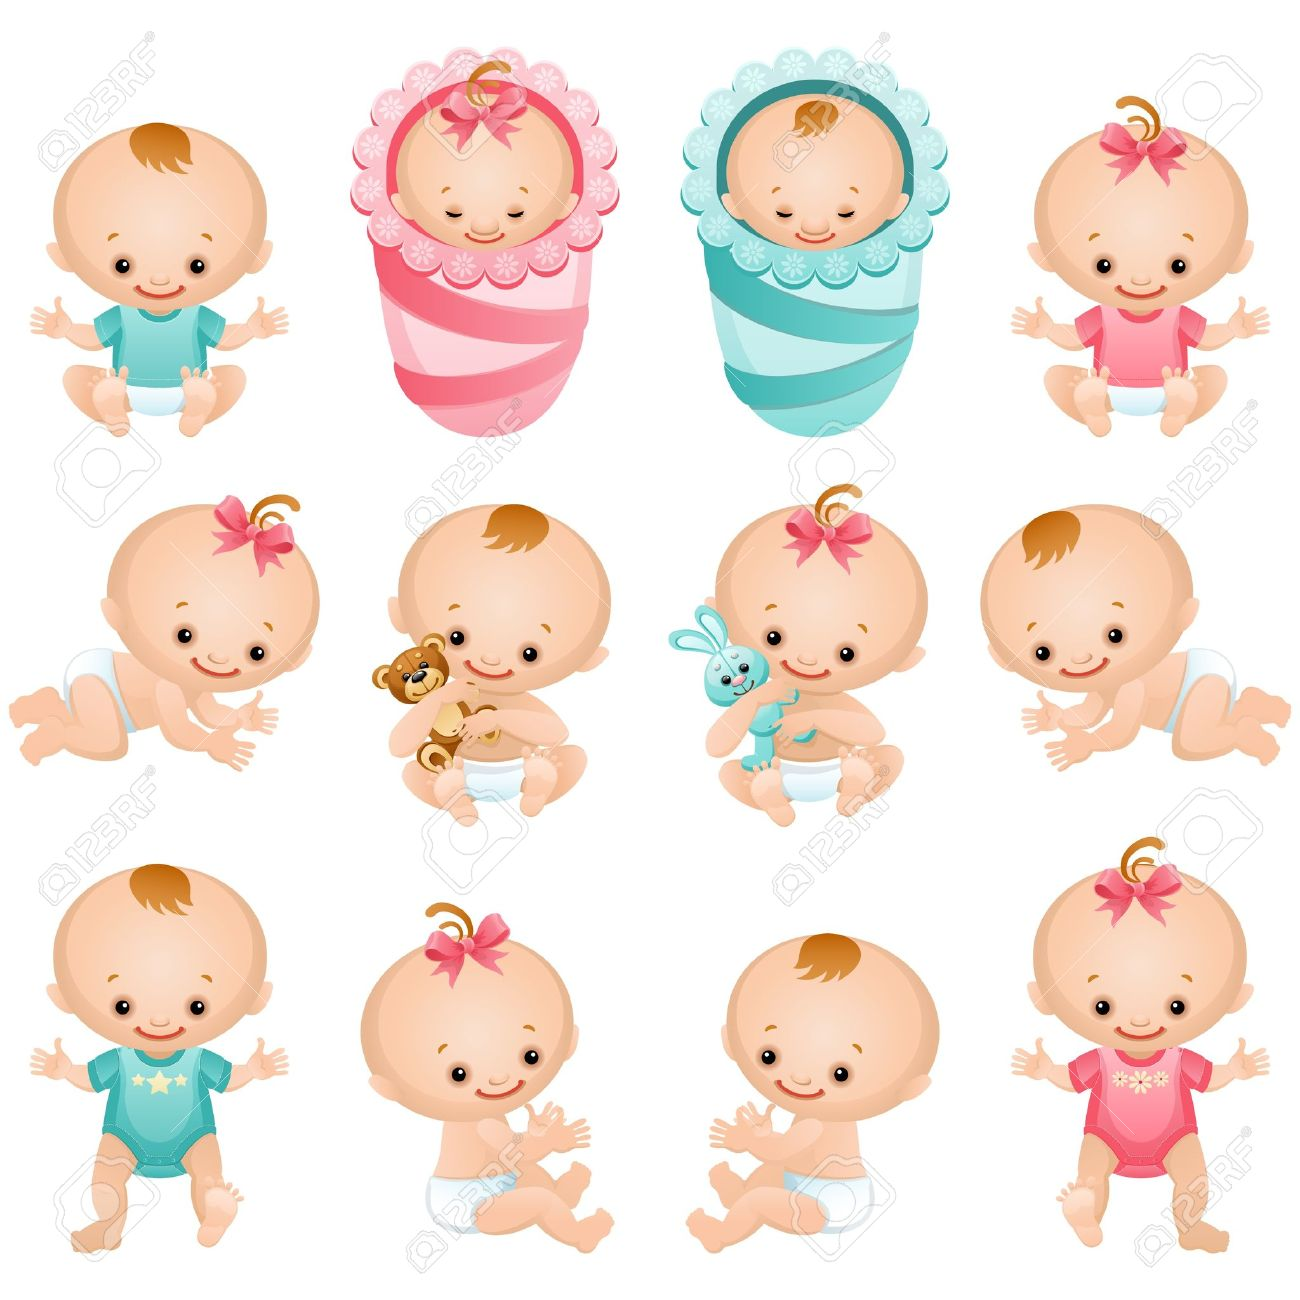 Baby Diaper Illustration Baby Diaper Vector